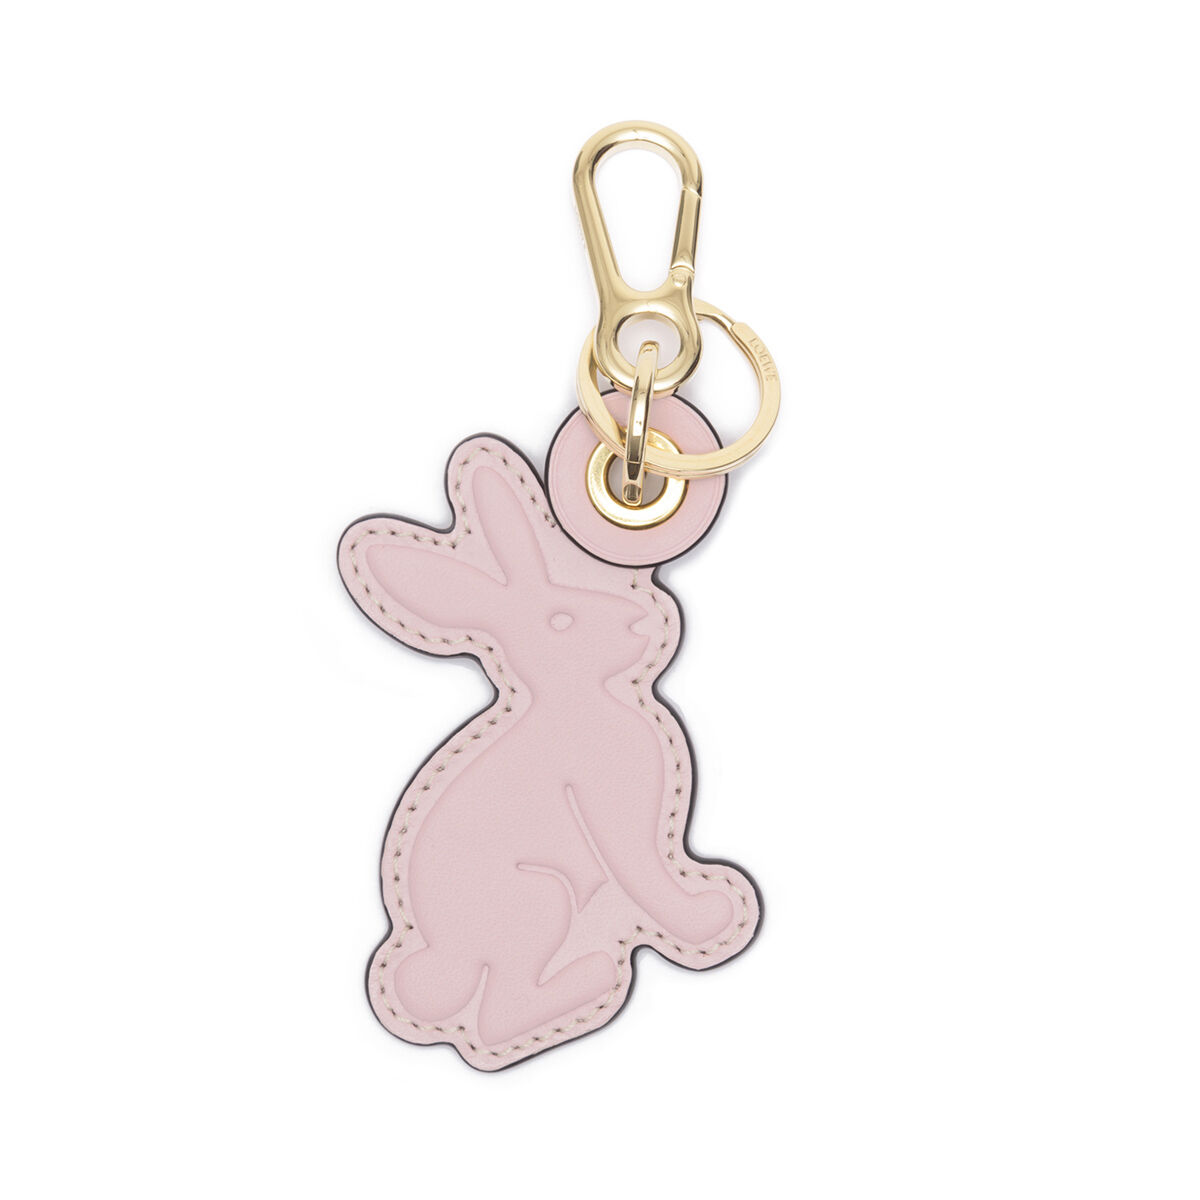 LOEWE Rabbit Leather Charm Light Pink/Blush all